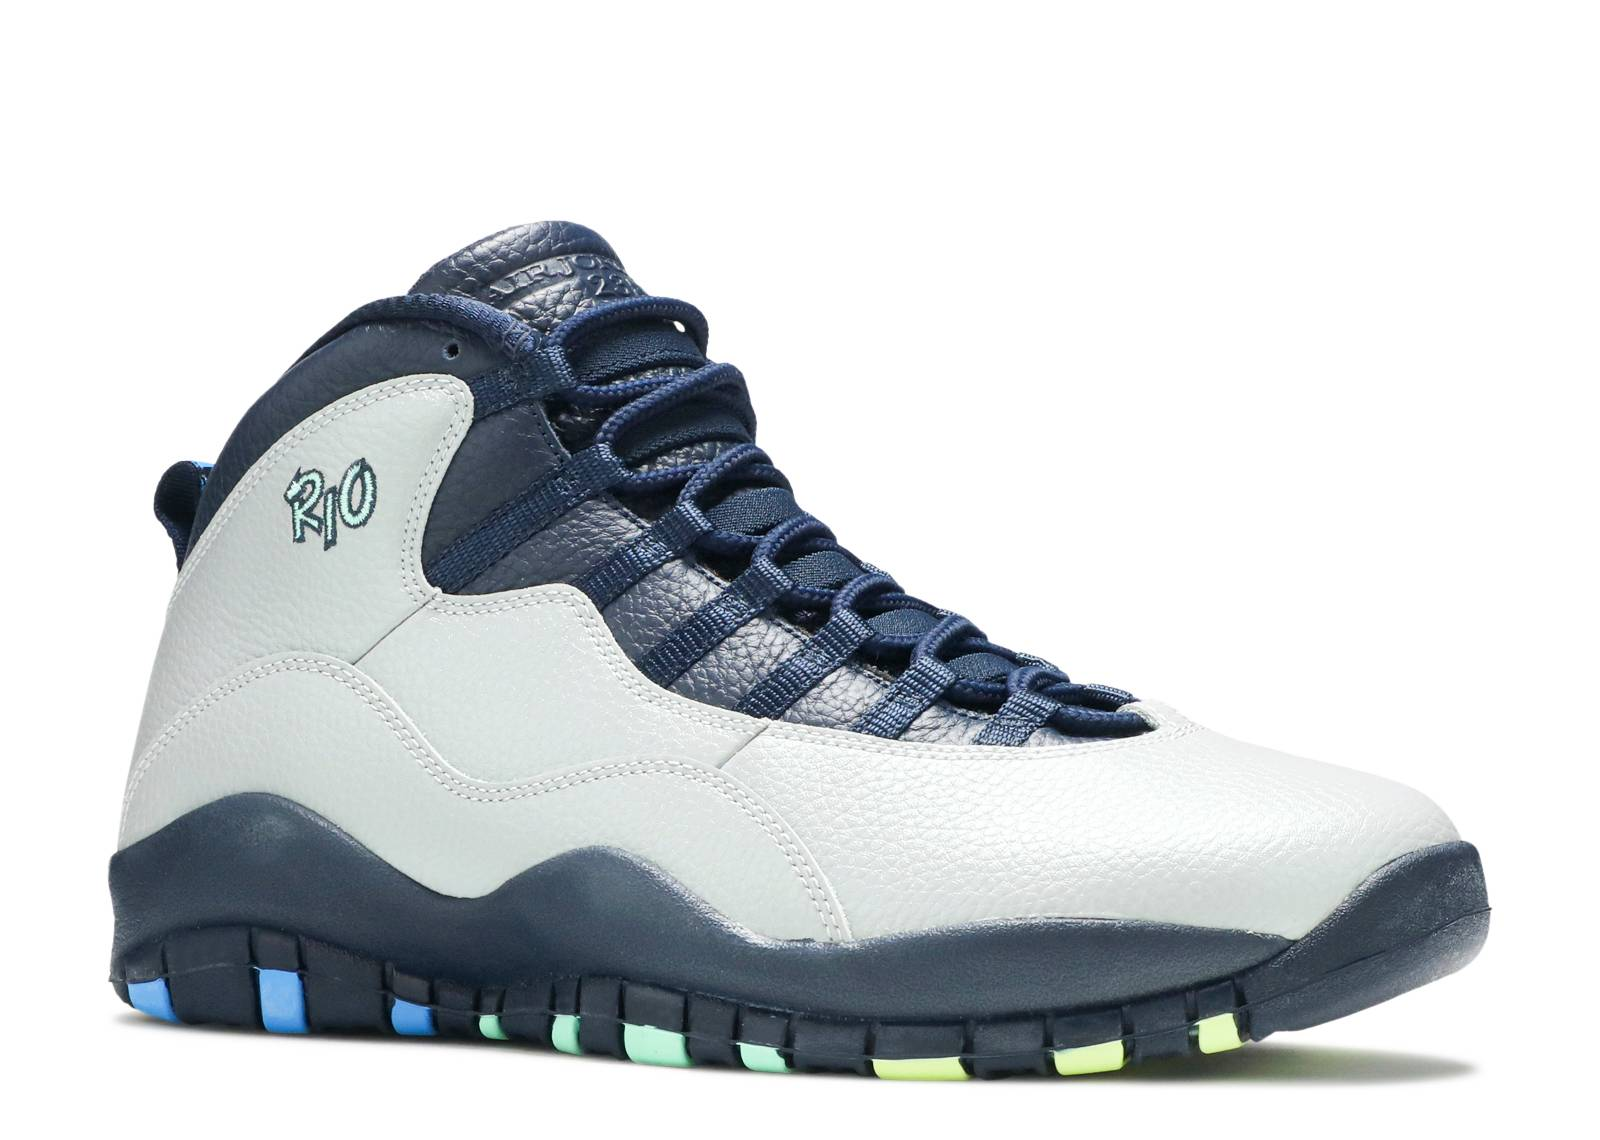 jordan 10 shoe